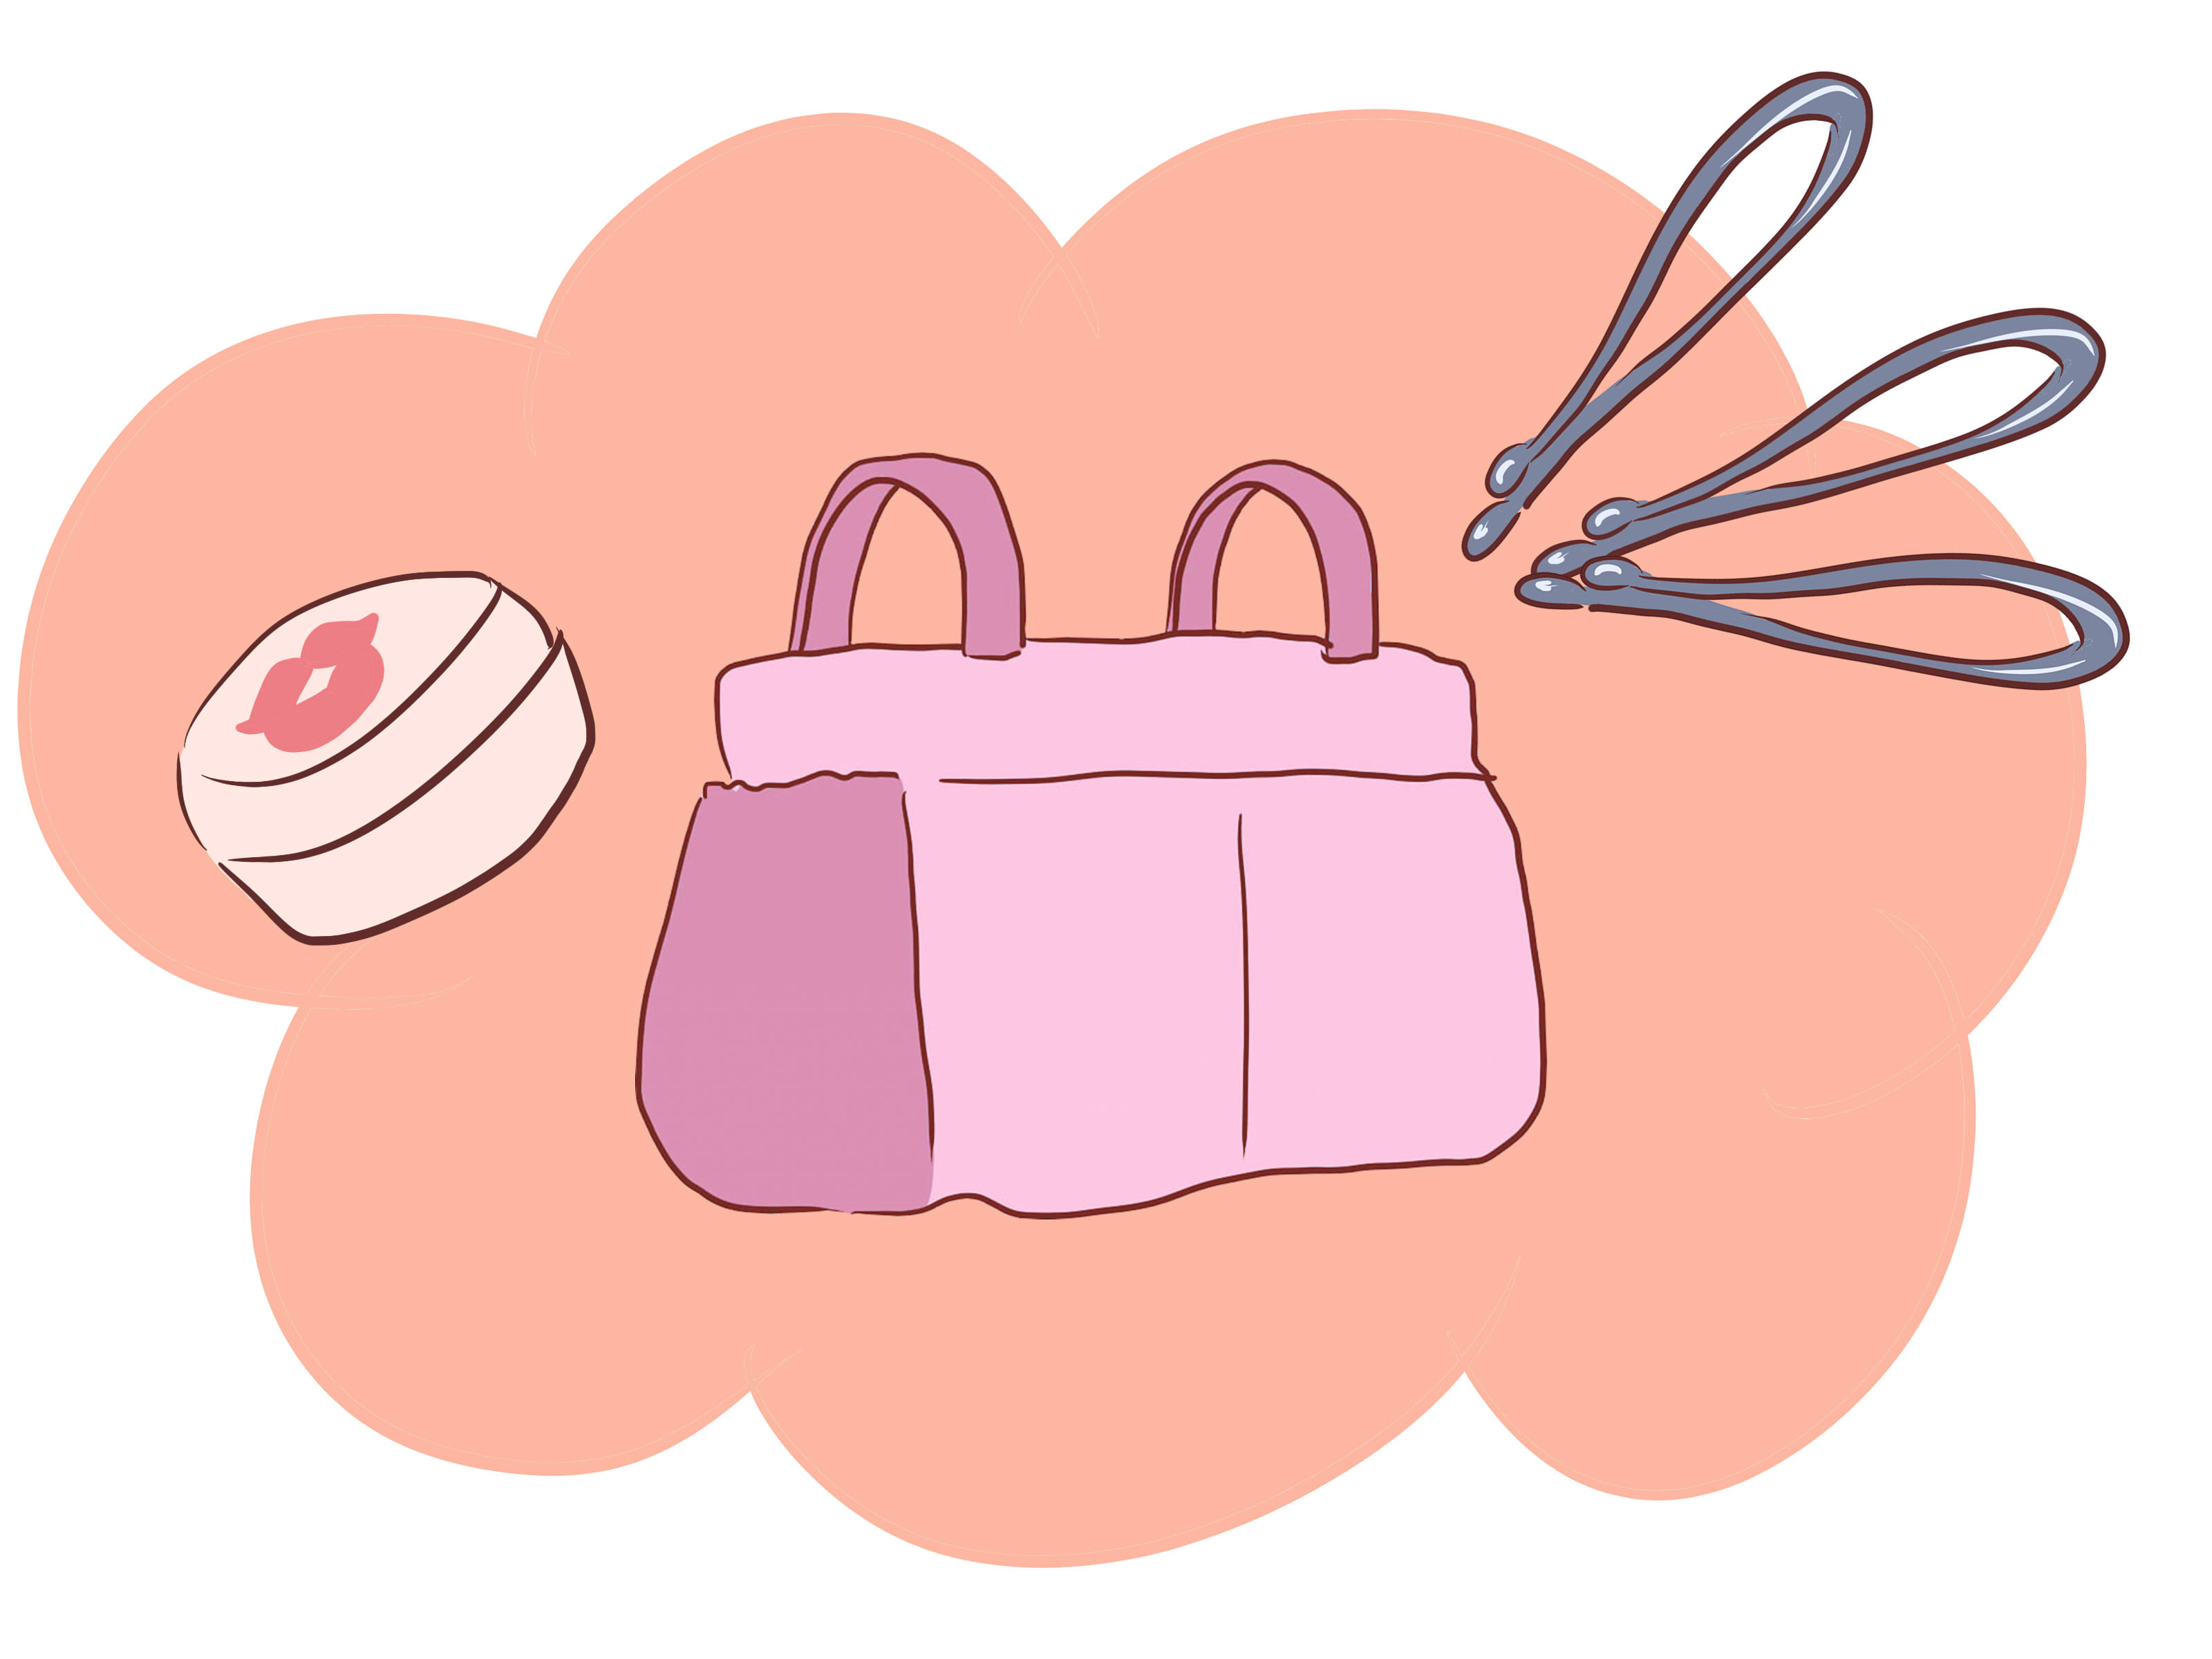 Bag clipart diaper bag, Bag diaper bag Transparent FREE for.